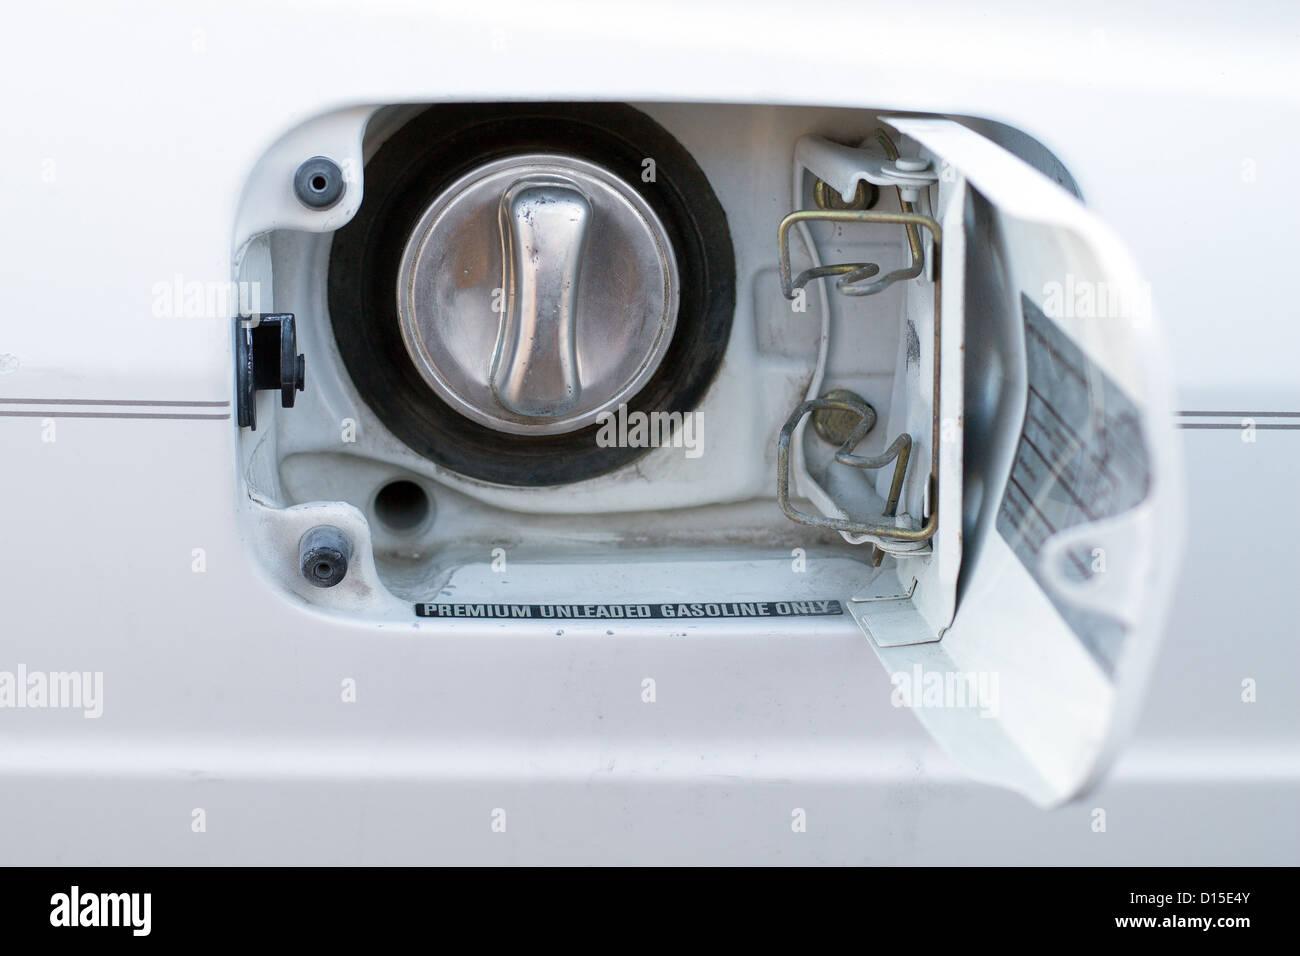 open fuel door on a car gas tank & open fuel door on a car gas tank Stock Photo: 52366635 - Alamy